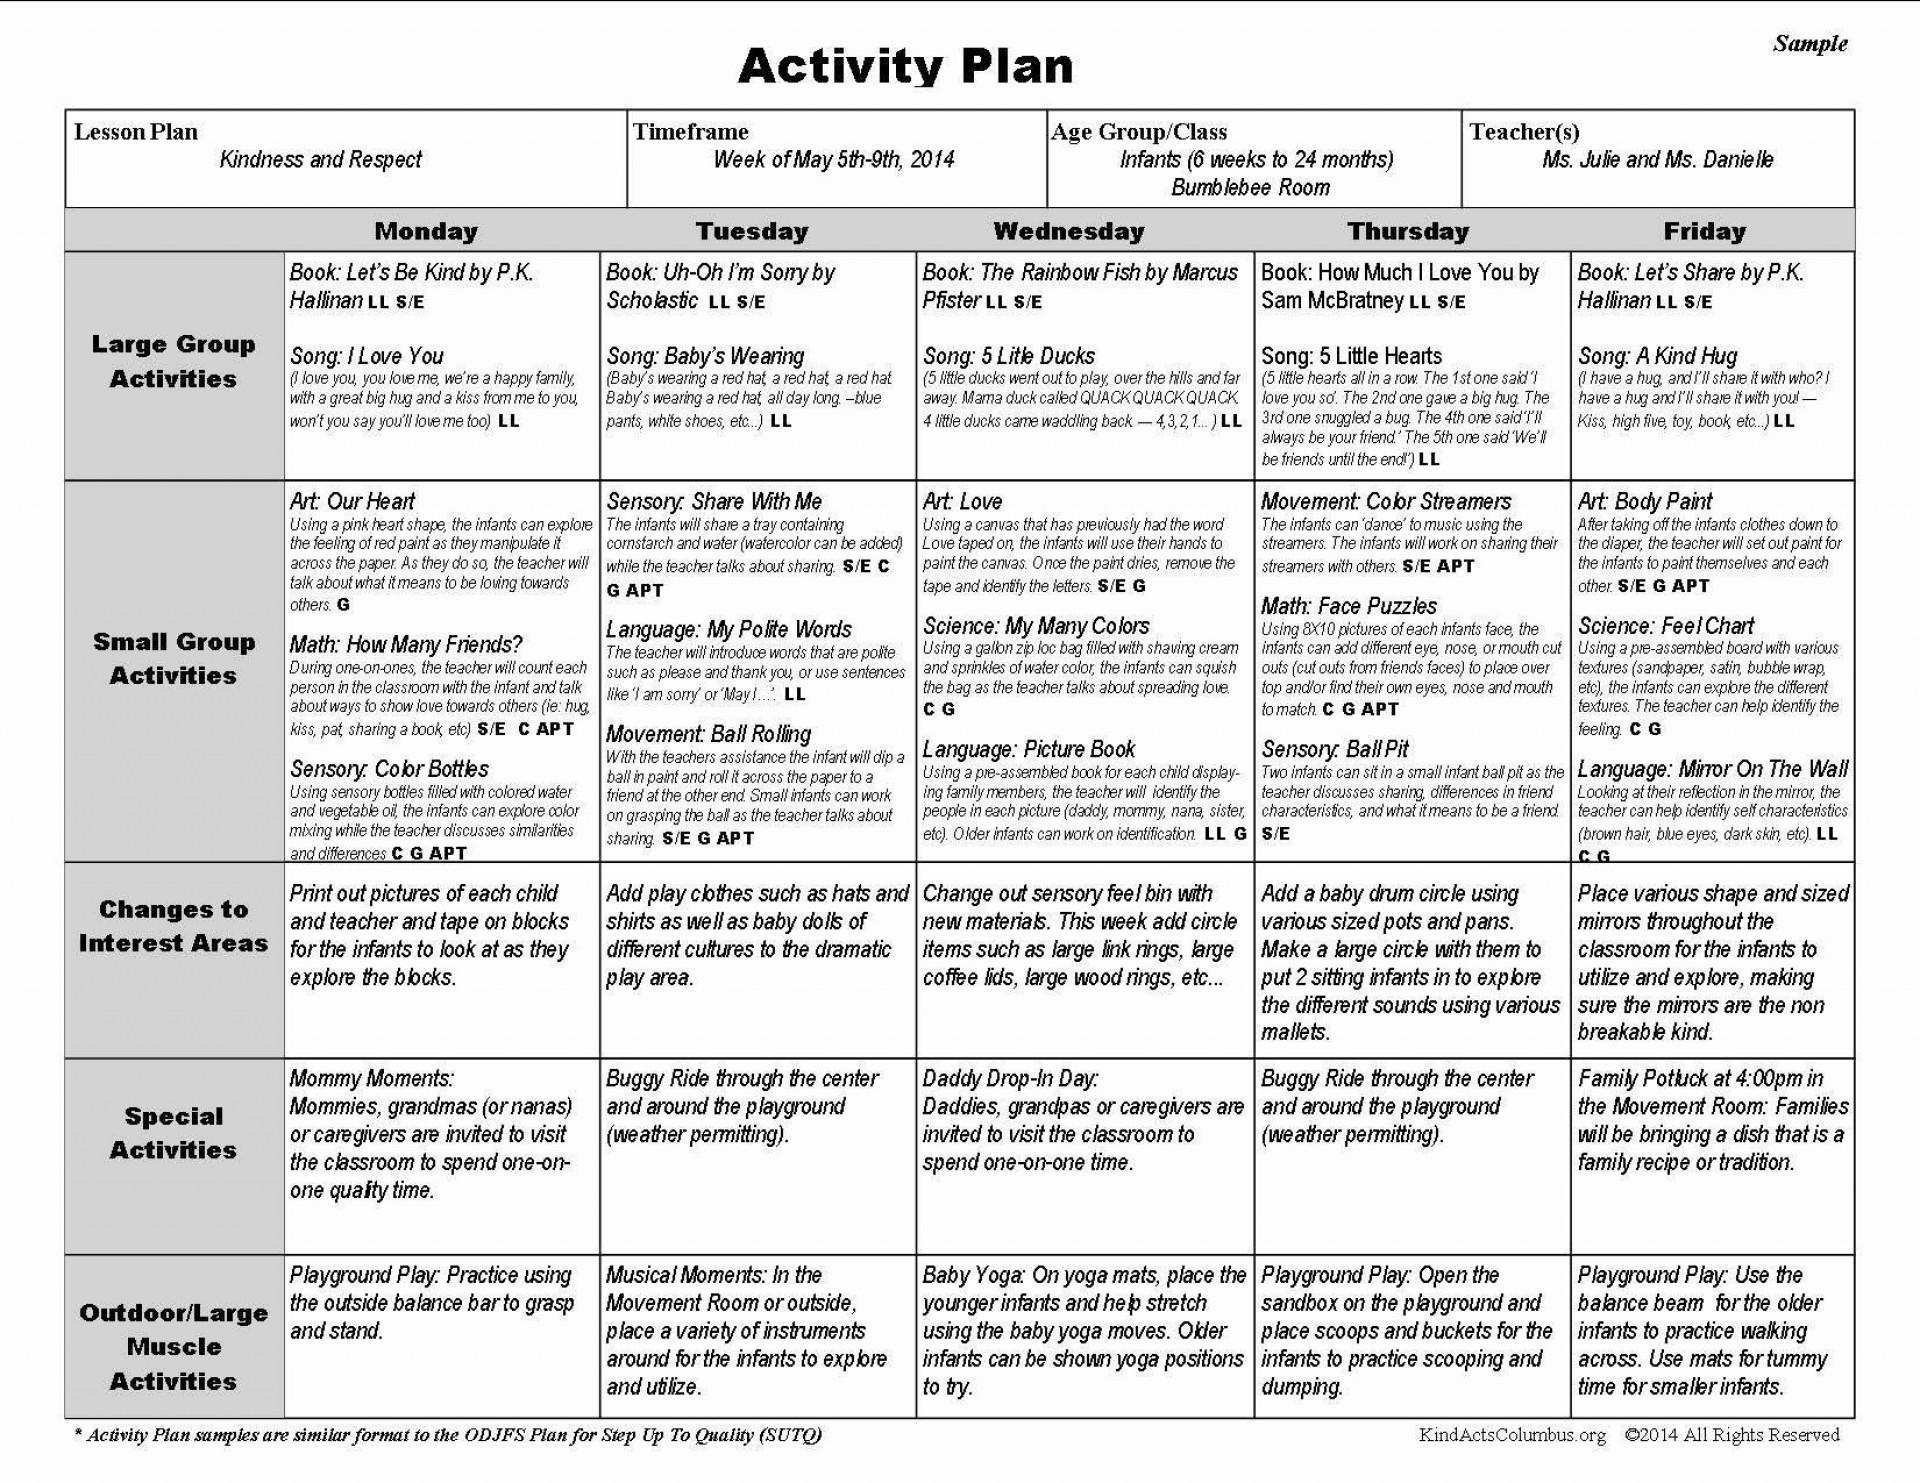 002 Exceptional Sample Pre K Lesson Plan Template High Def  Preschool Format Pre-k1920